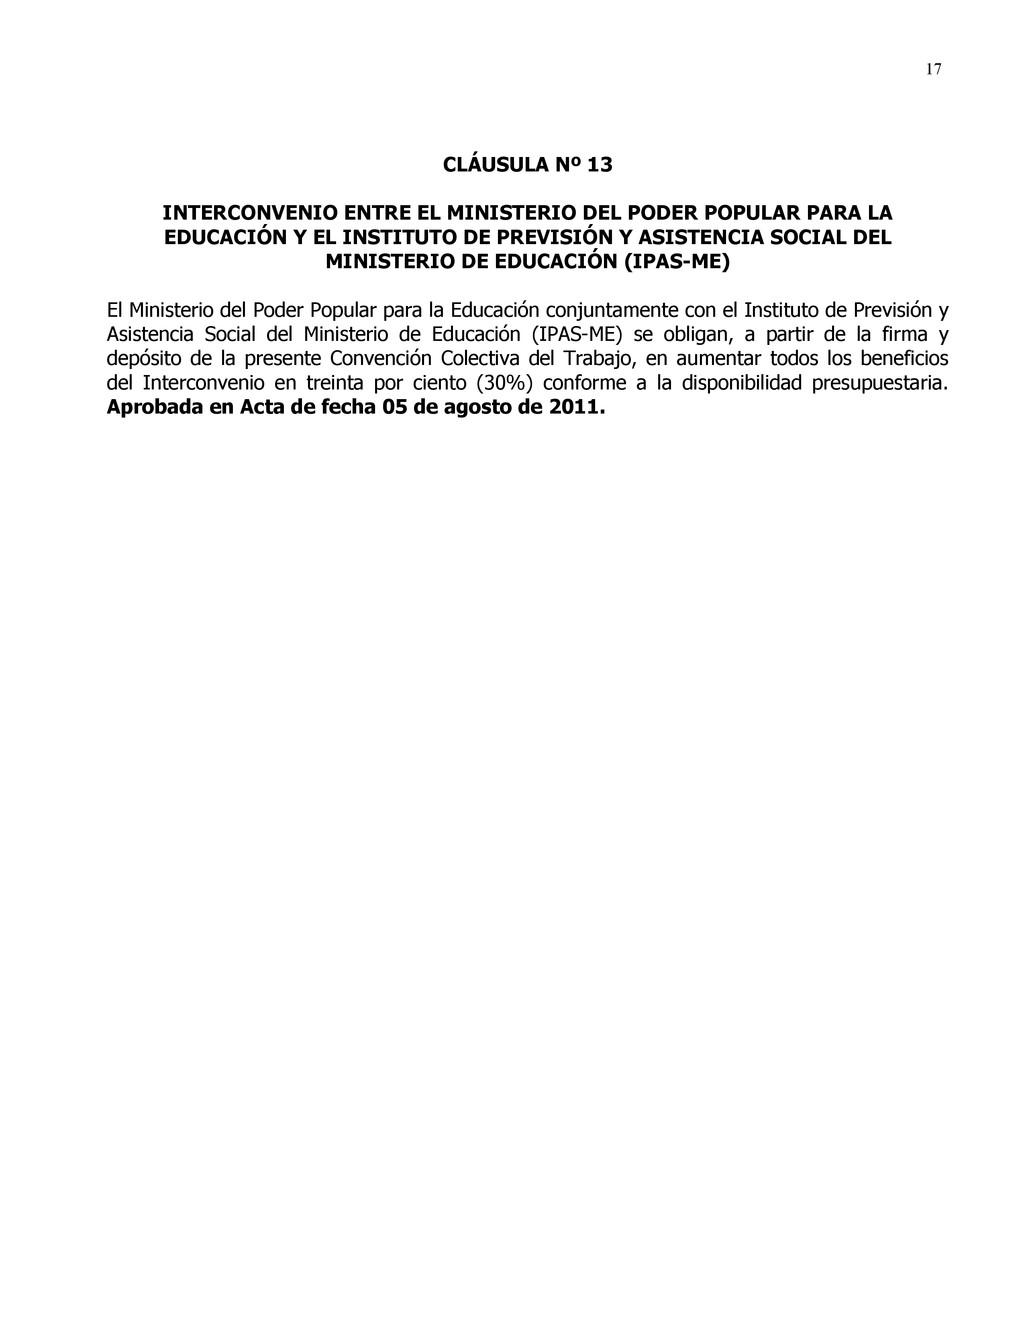 17 CLÁUSULA Nº 13 INTERCONVENIO ENTRE EL MINIST...